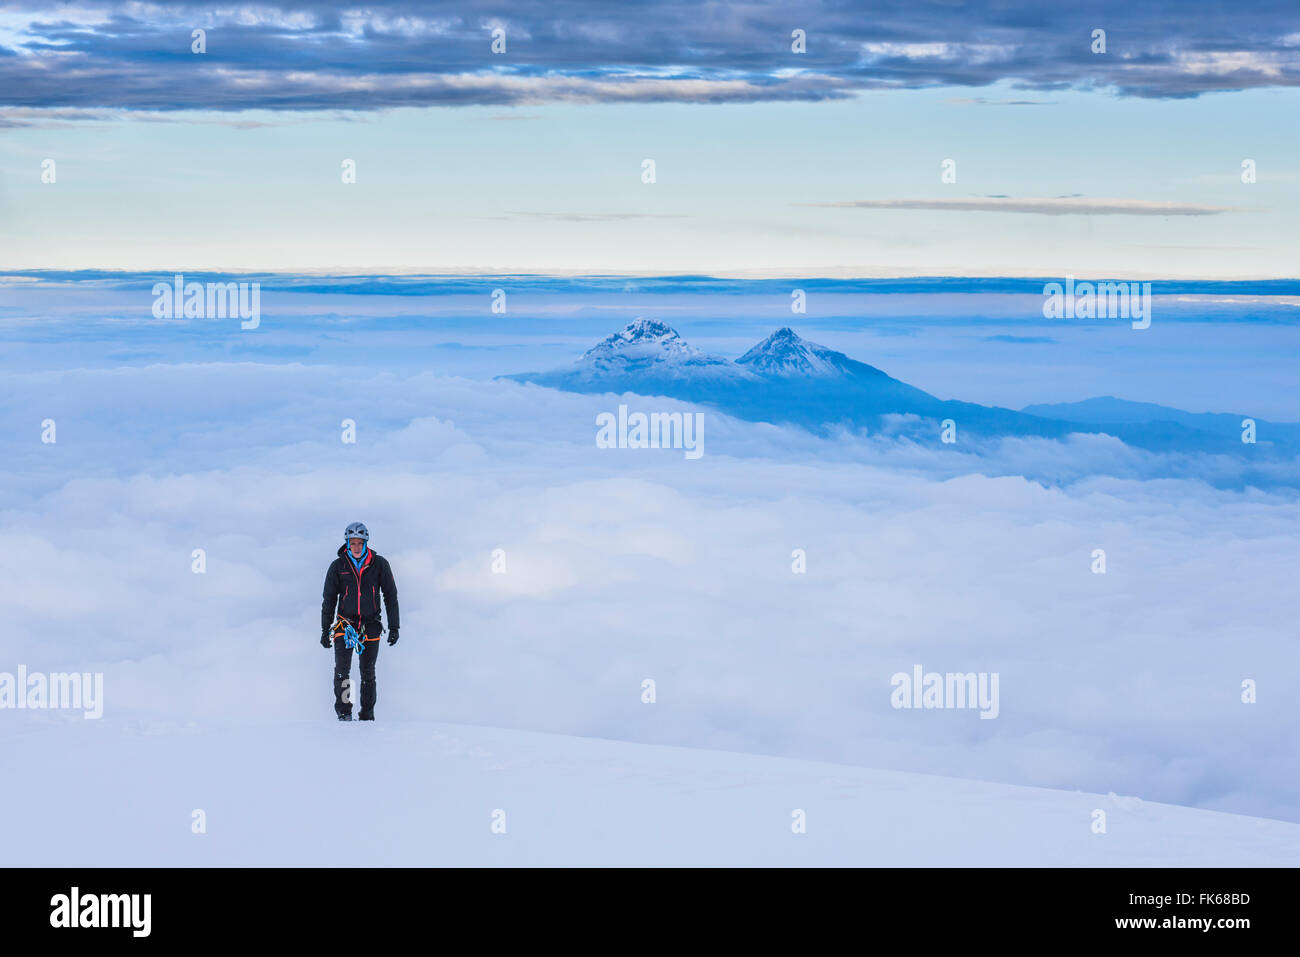 Bergsteiger auf den letzten 20m auf den 5897m Gipfel des Cotopaxi Vulkan, Provinz Cotopaxi in Ecuador, Südamerika Stockbild